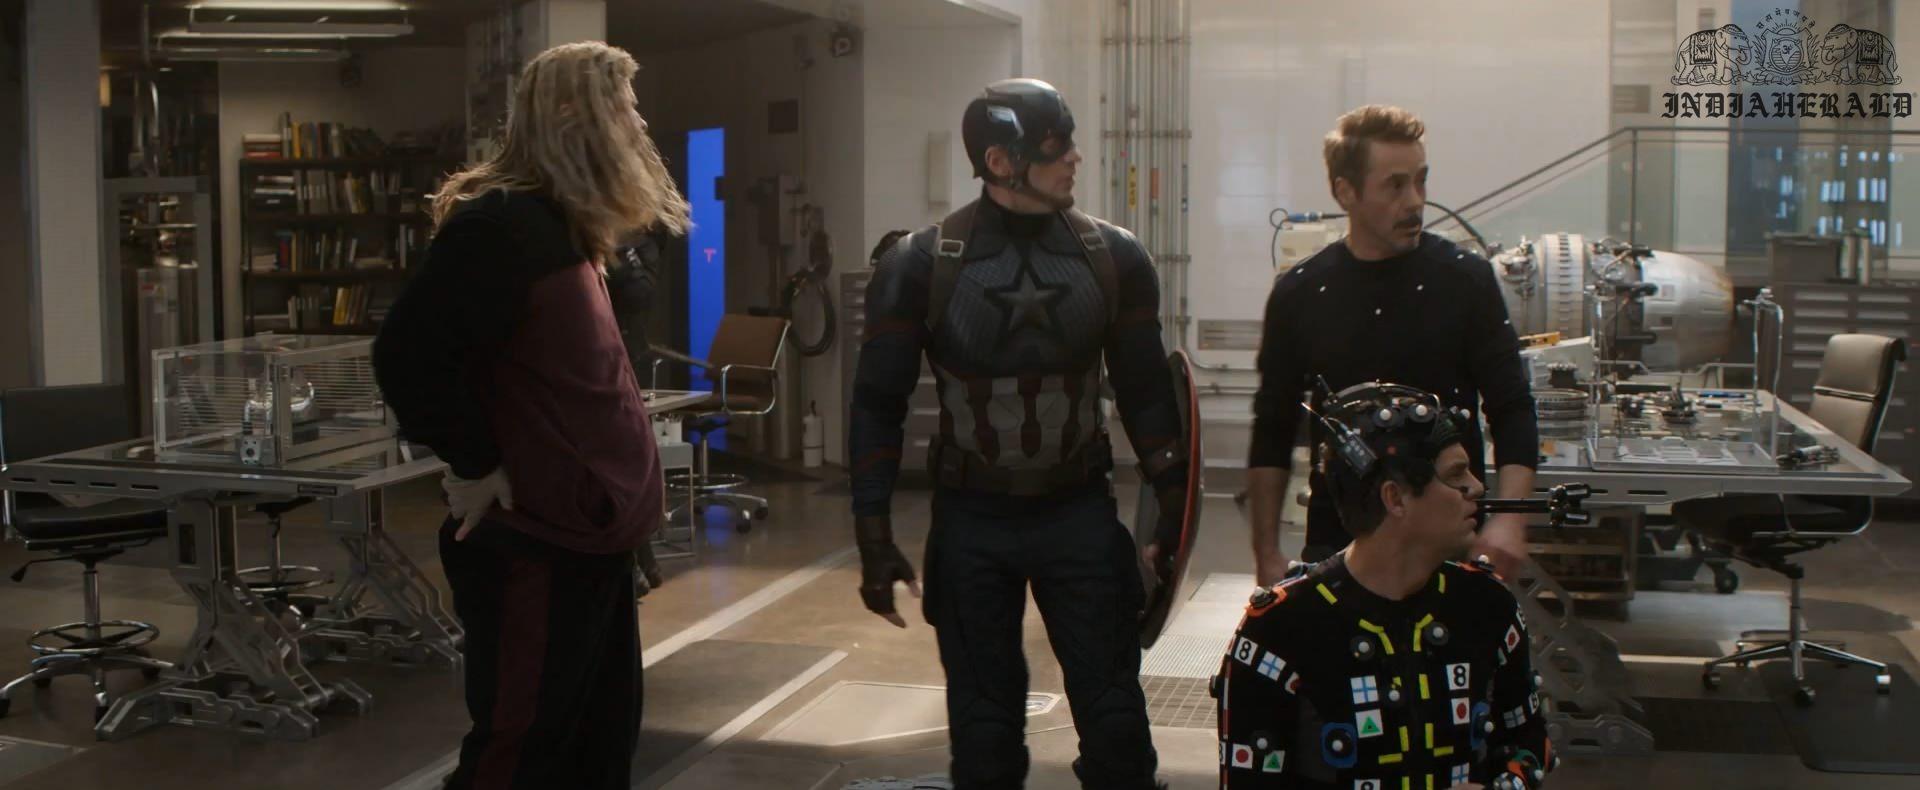 India Herald Exclusive Unseen BTS Photos Of Avengers Endgame Set 3